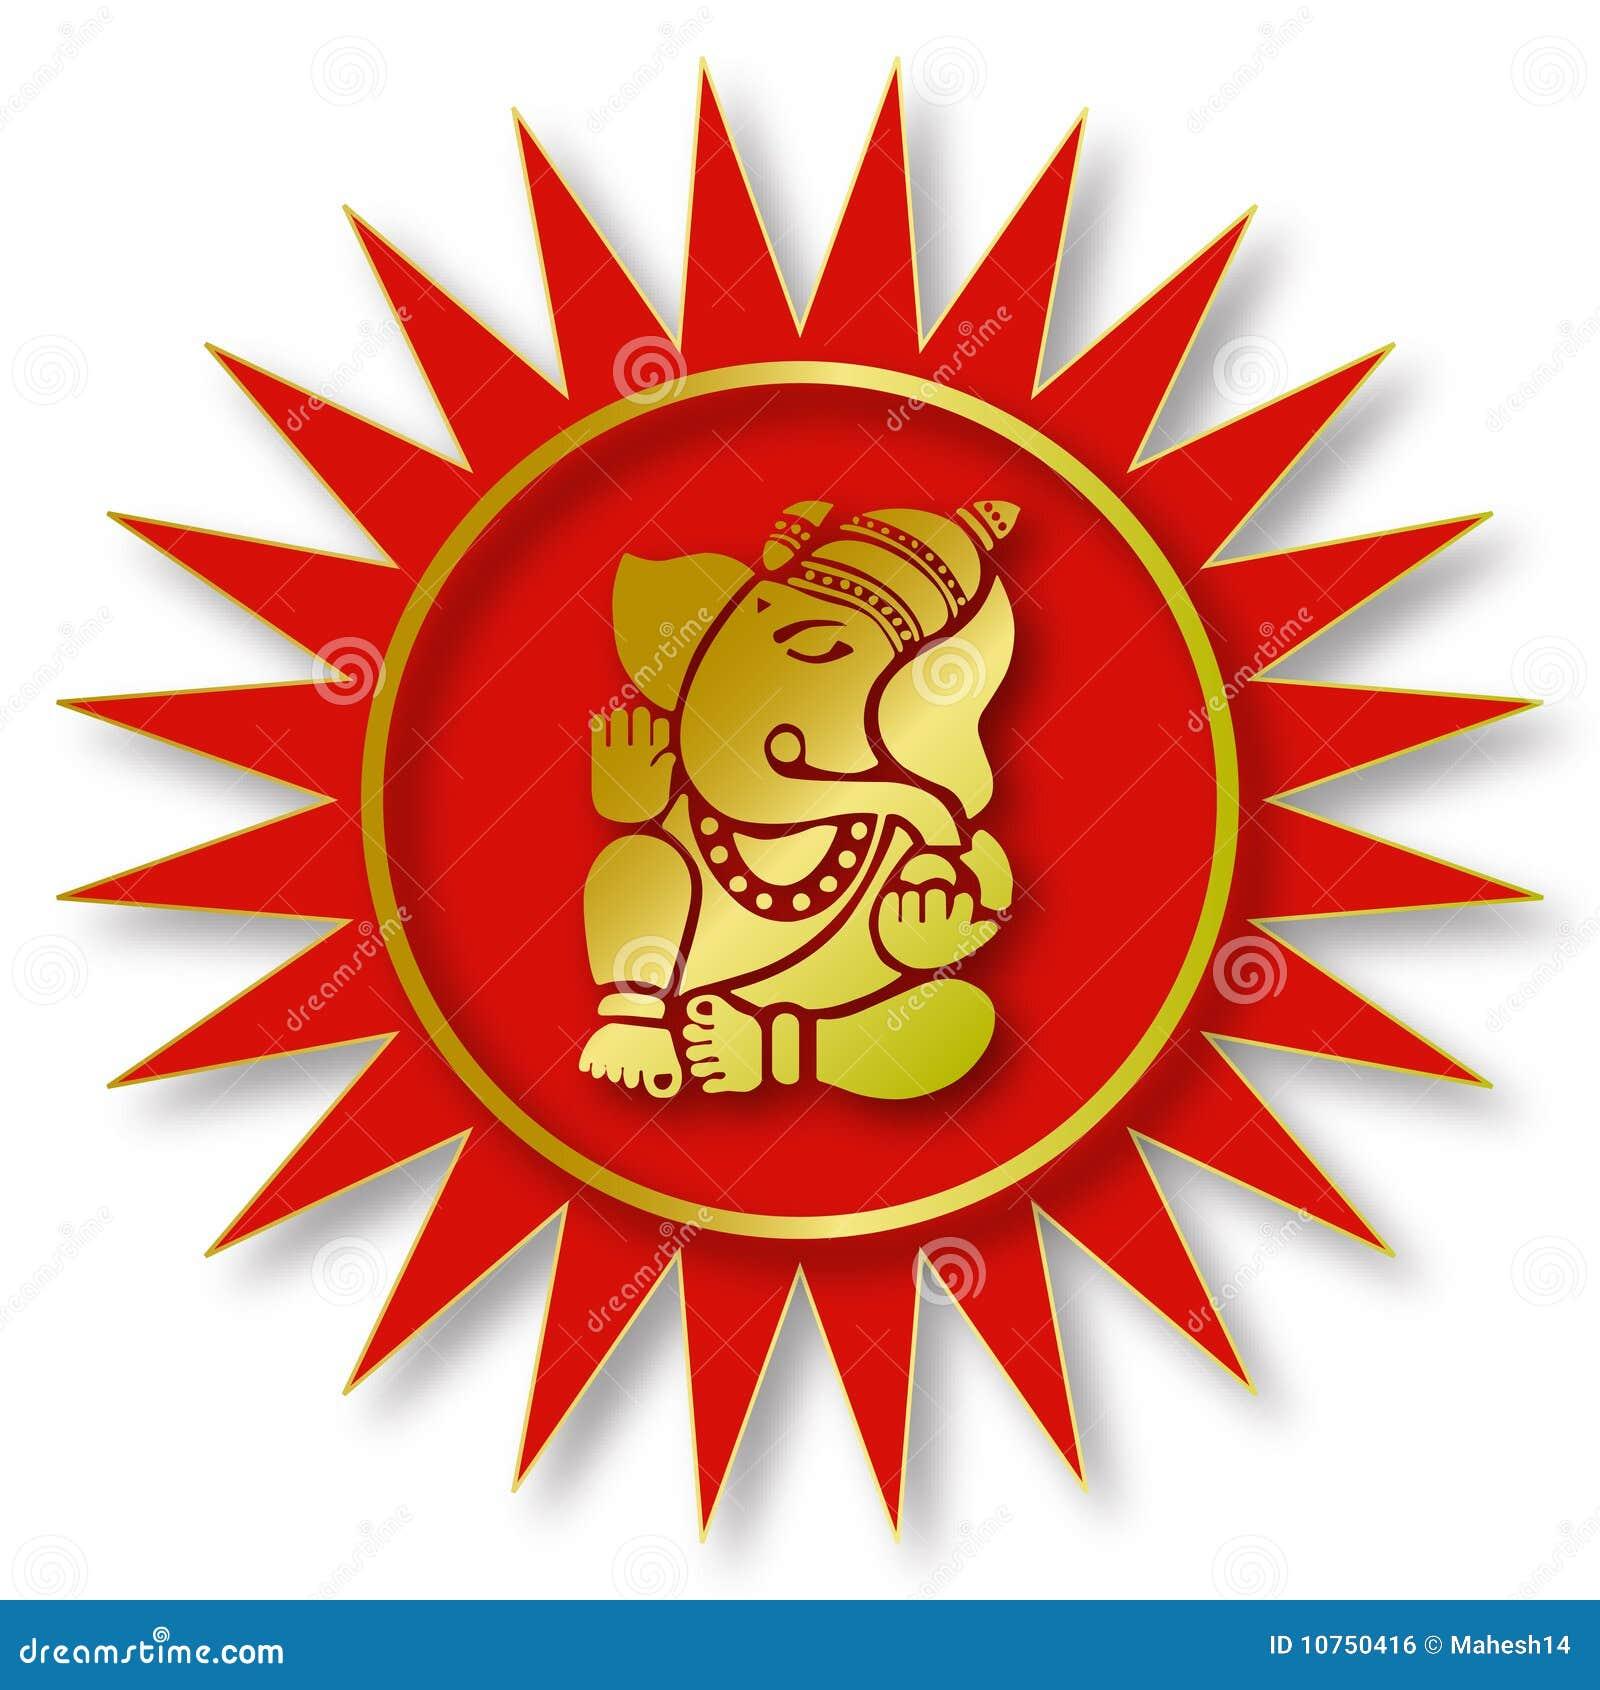 Lord ganesha sign stock illustration illustration of symbol lord ganesha sign buycottarizona